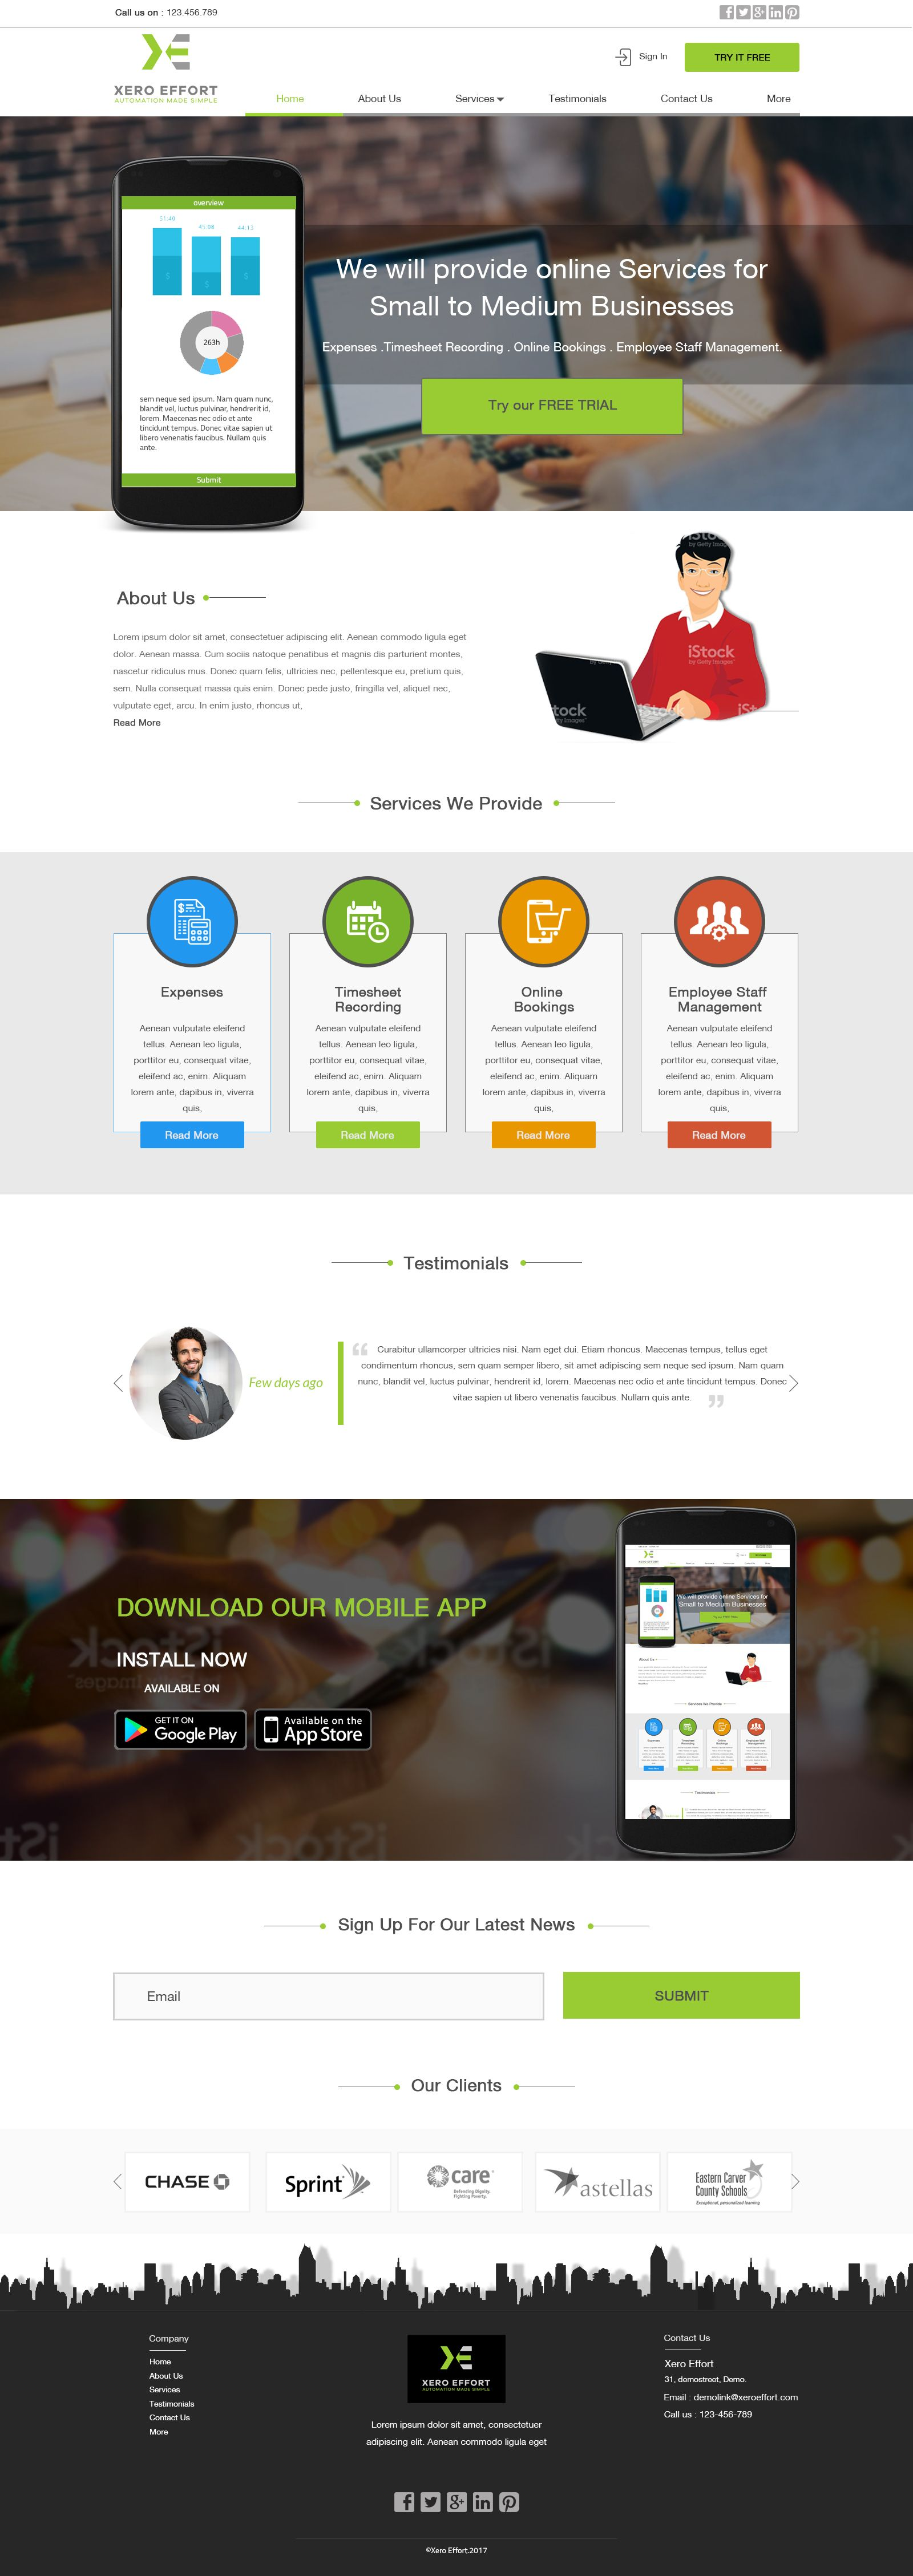 An HR Management Website Design created by Digilife